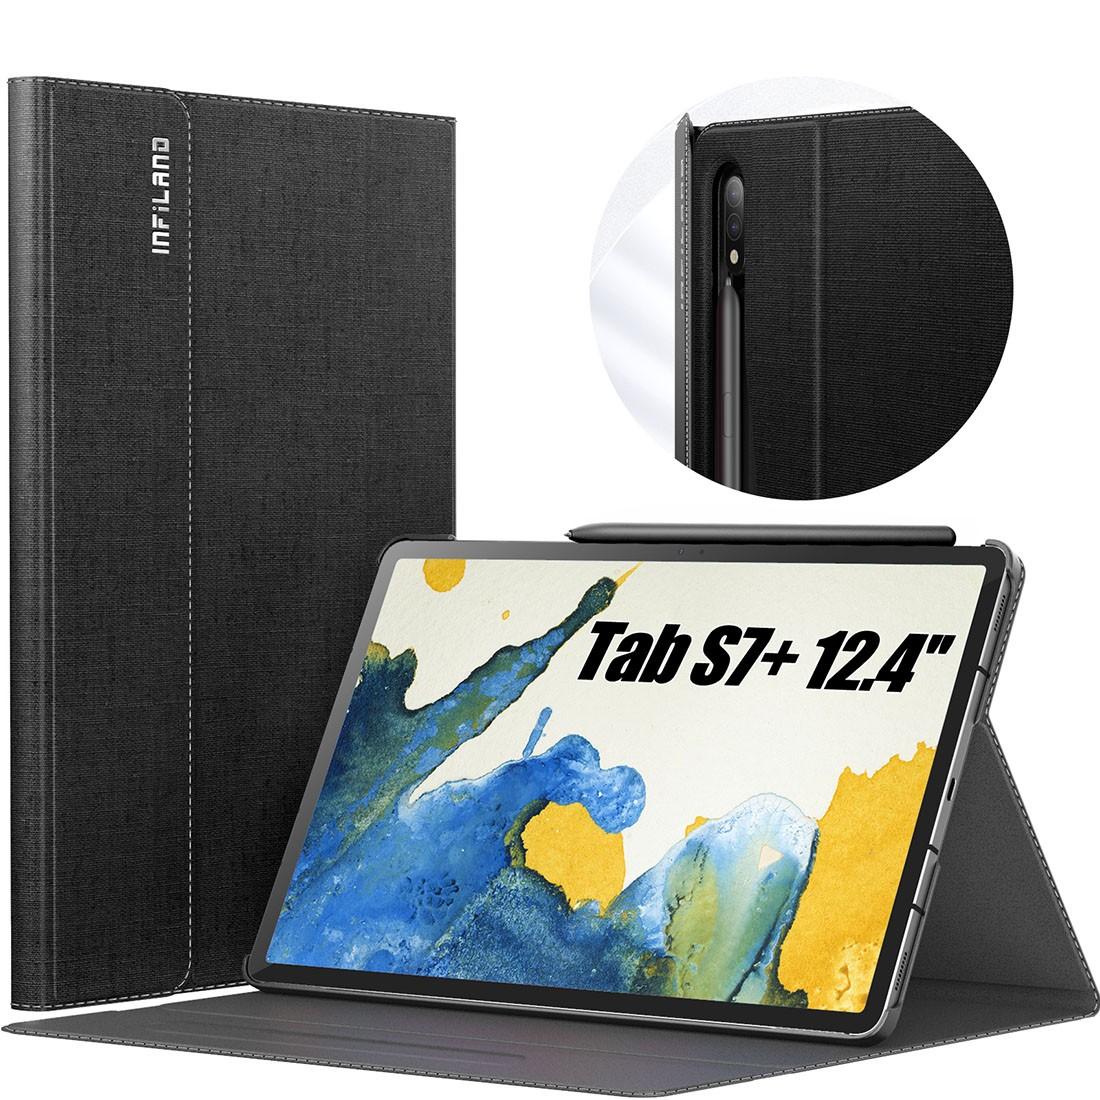 Capa Premium Classic Series com Fino Acabamento Galaxy Tab S7 Plus 12.4 pol 2020 SM-T970 e SM-T975